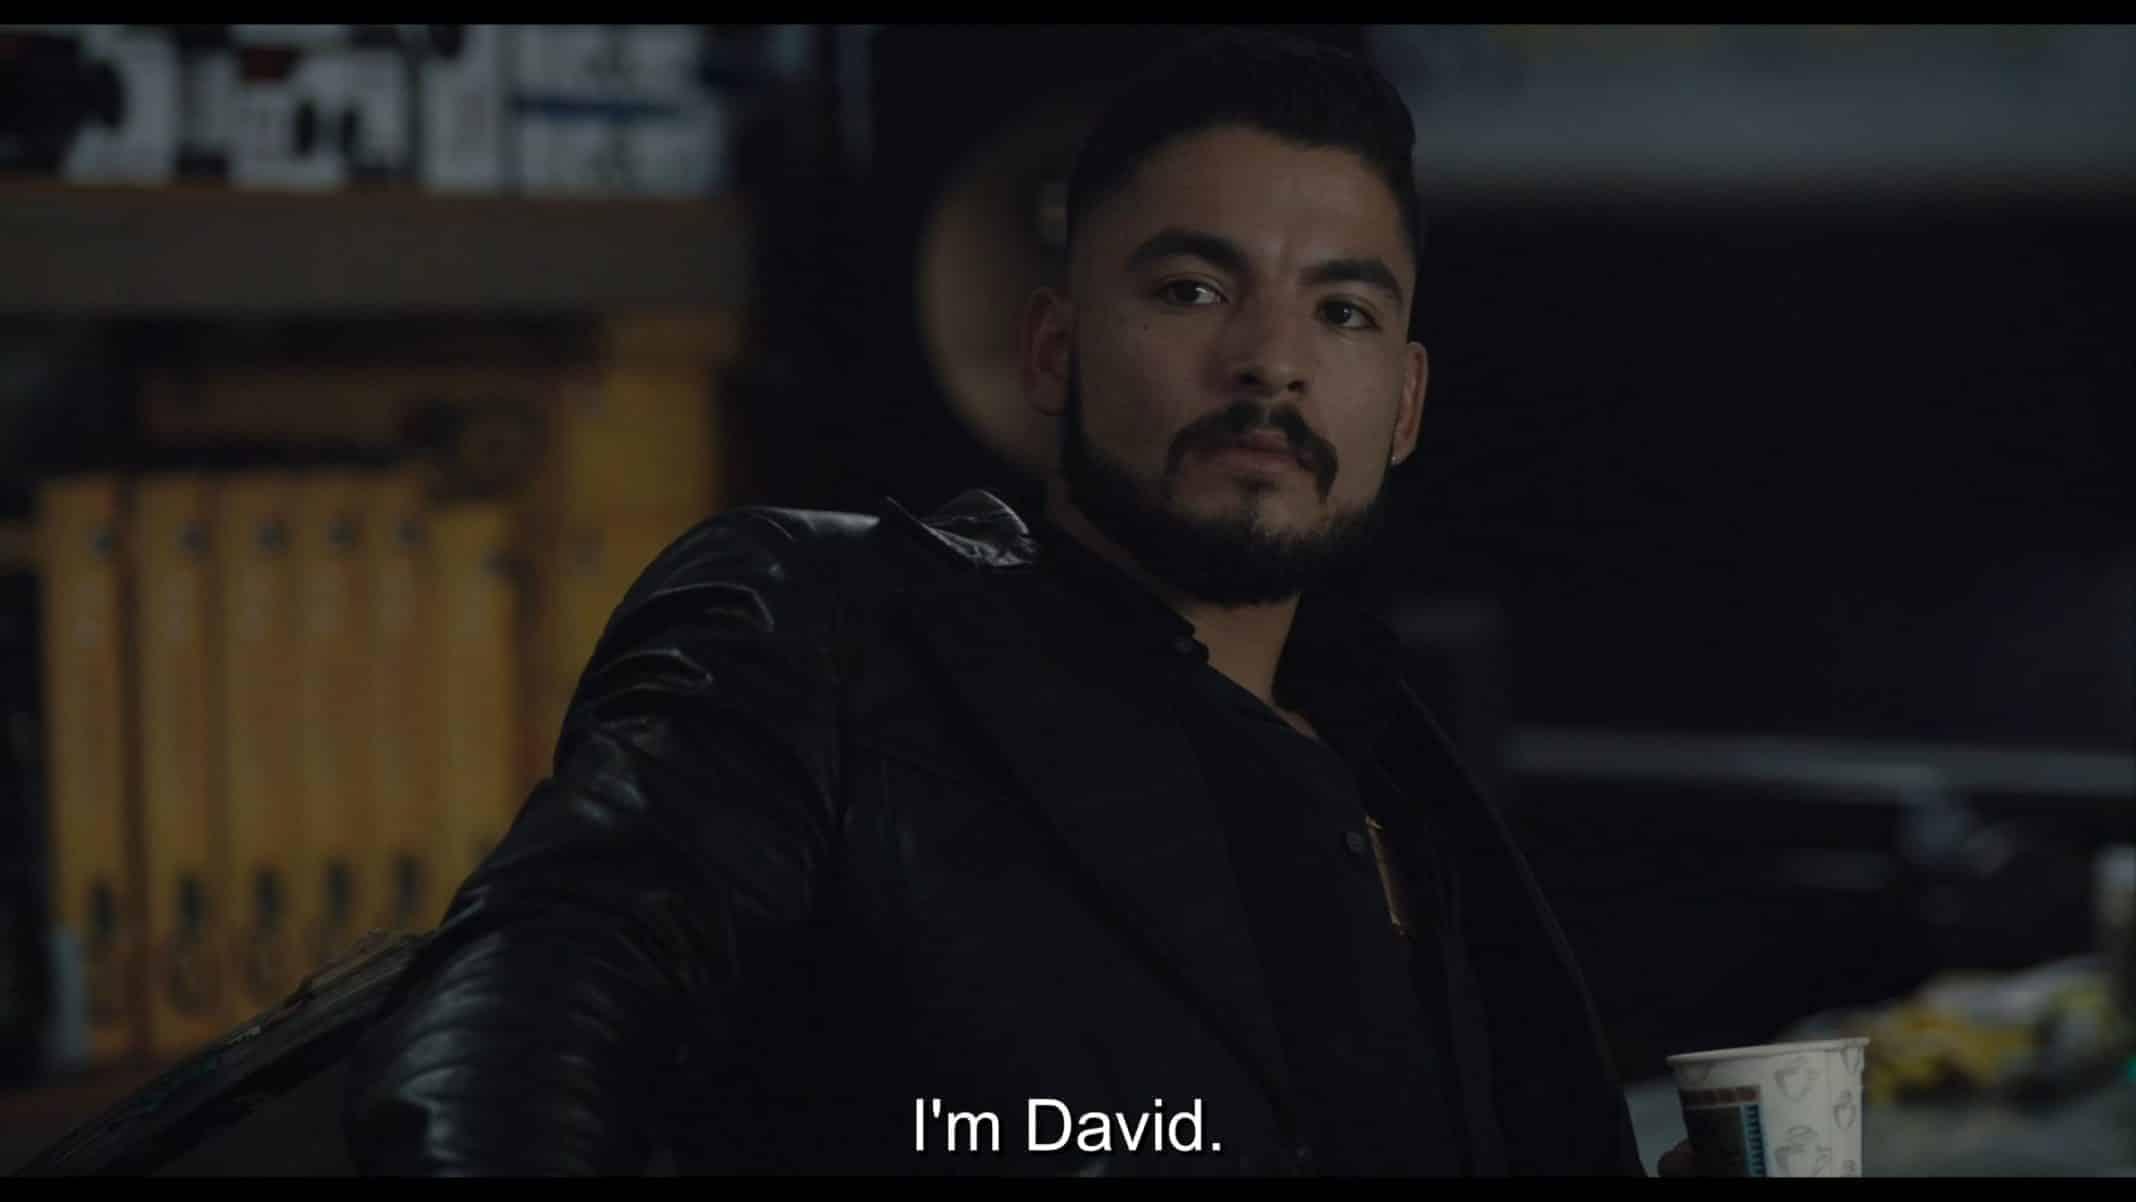 David (Bobby Soto) introducing himself